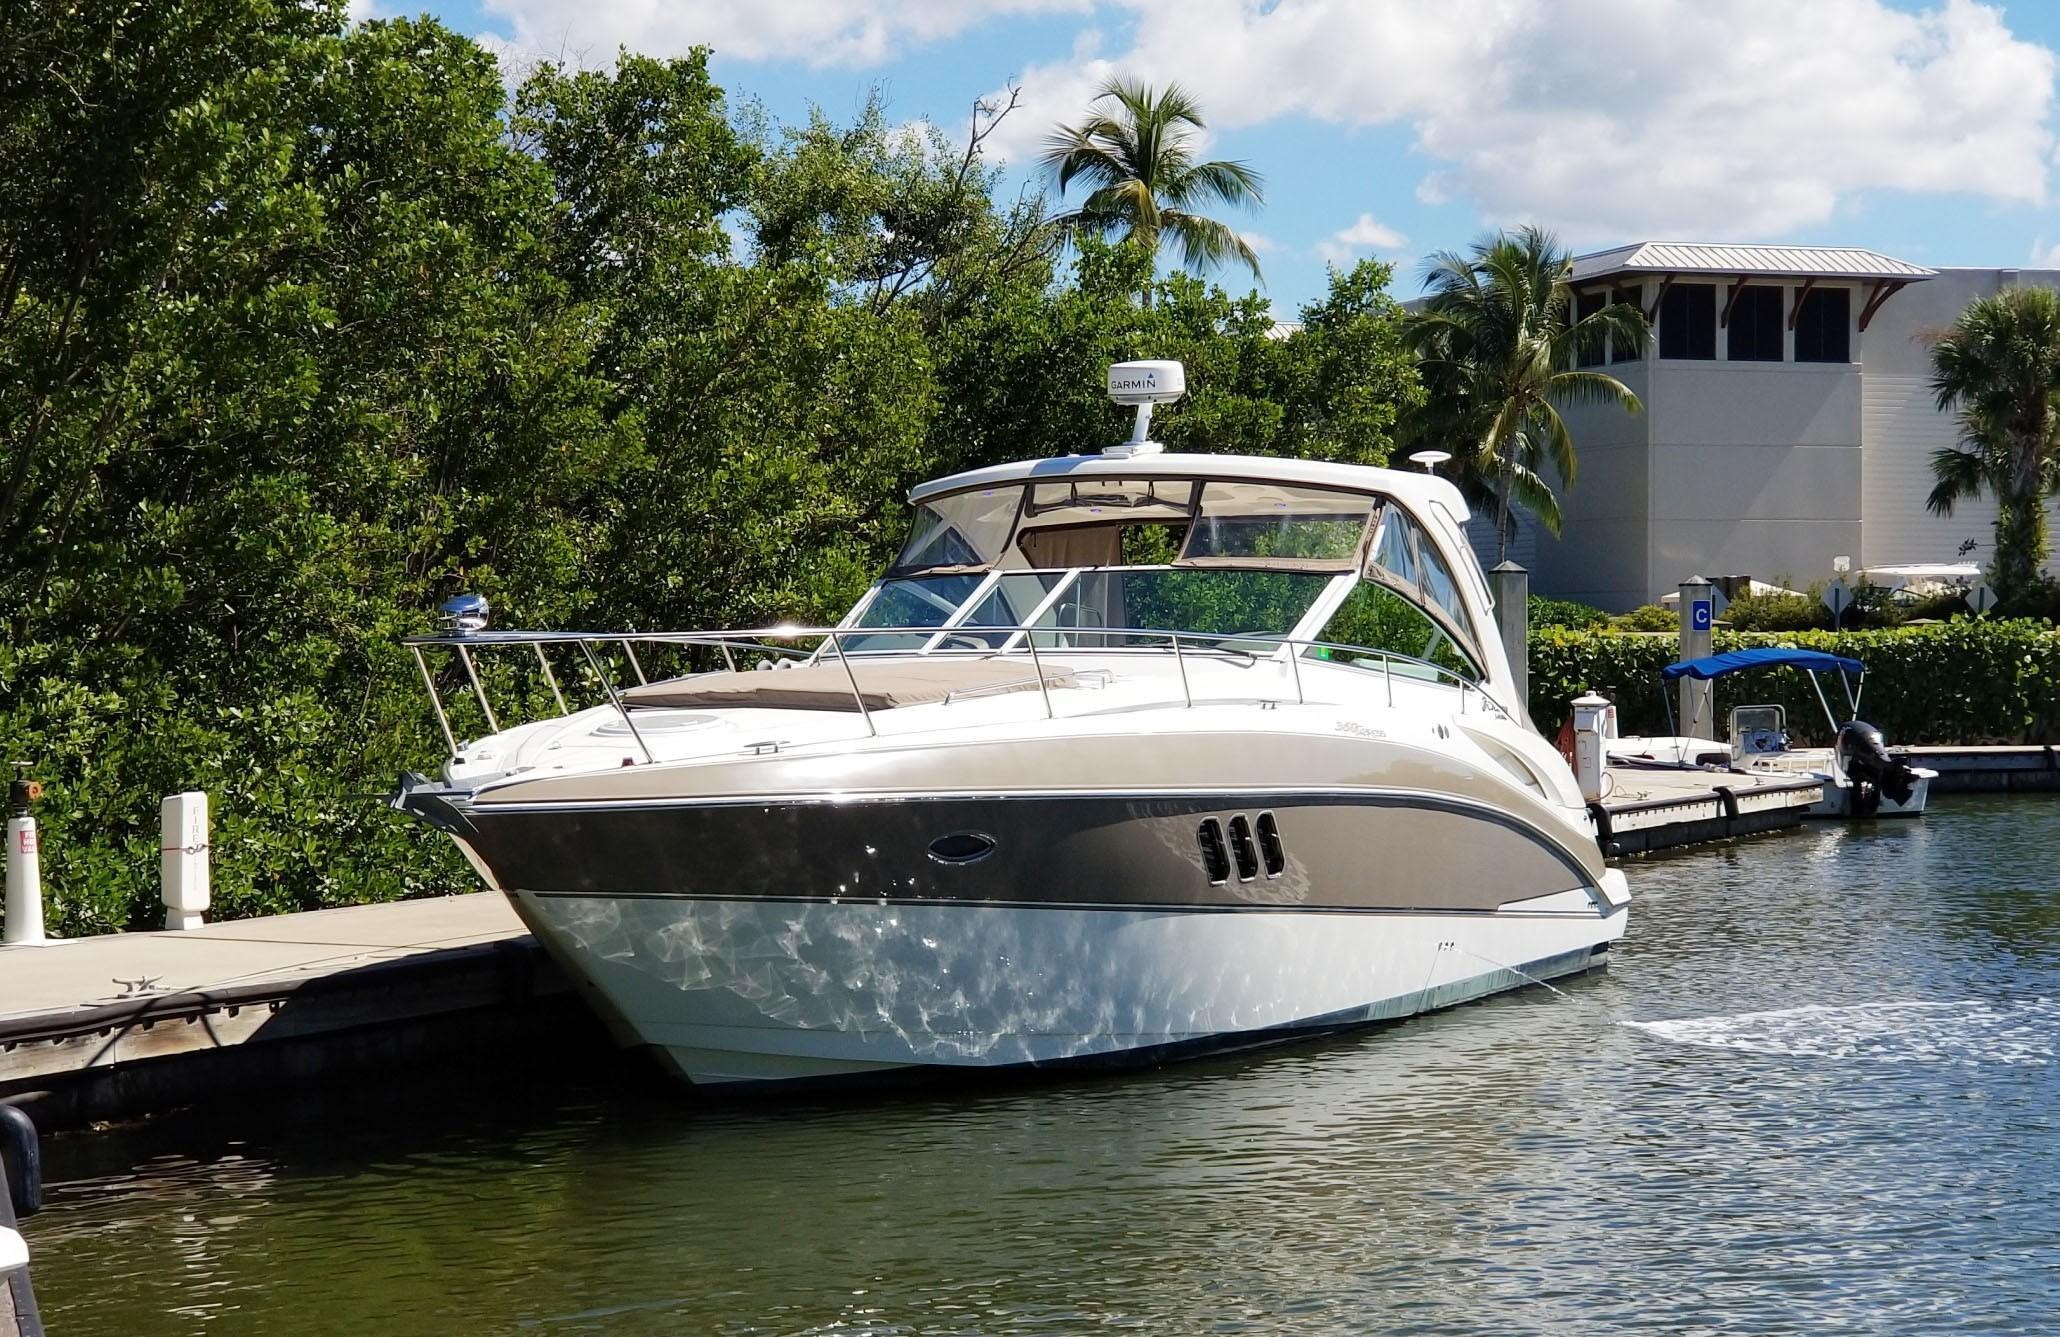 38 Cruisers Yachts B60309 2011 Miami Denison Yacht Sales